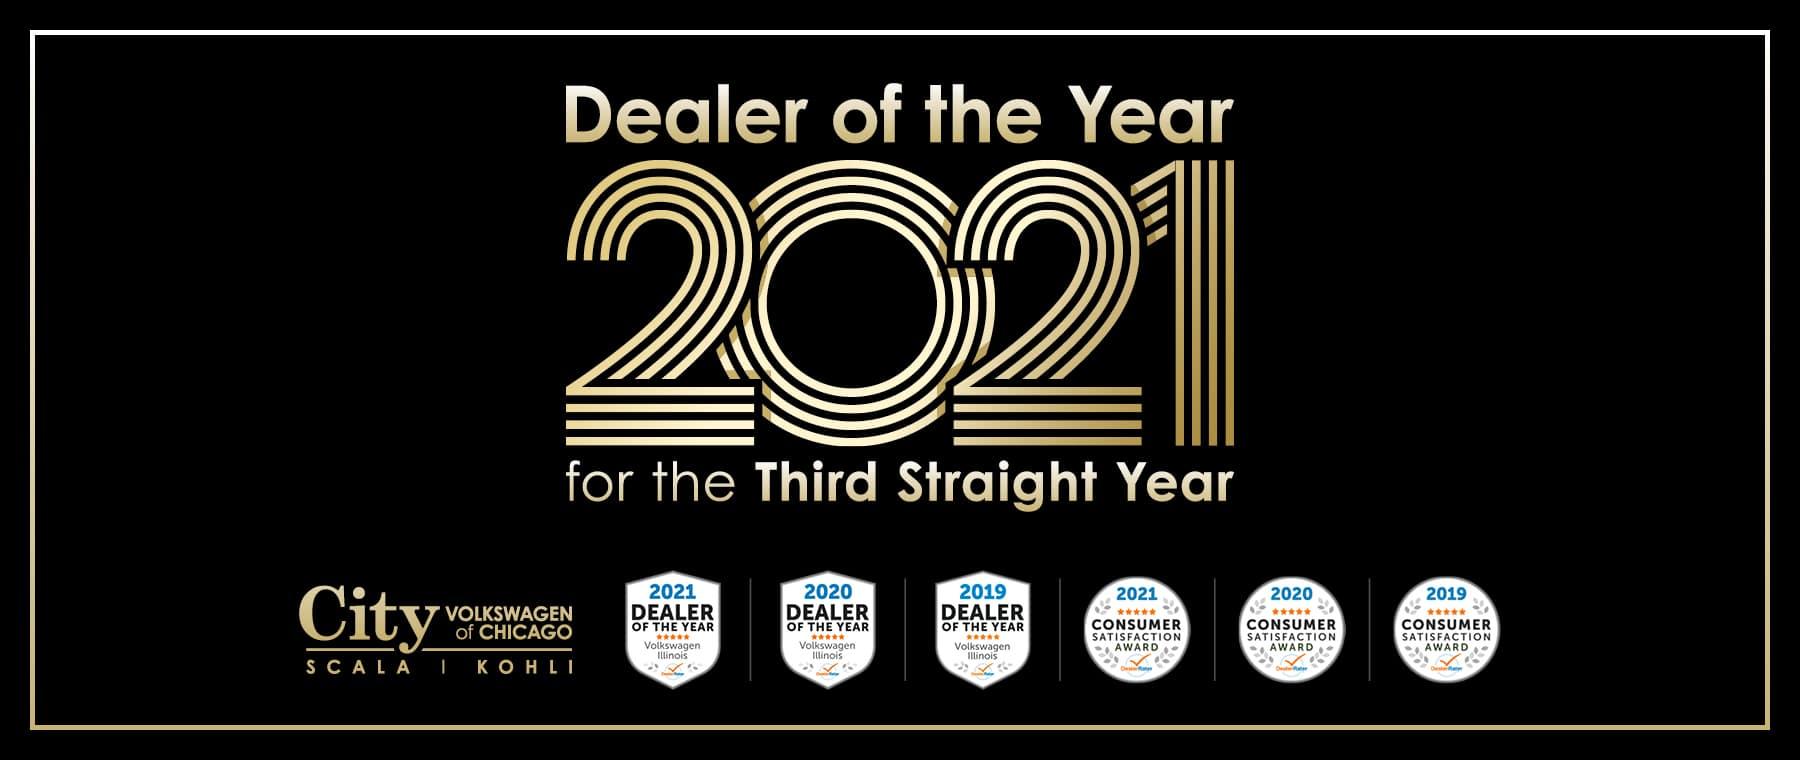 SKA-21-0005 January Promotions-Chicago-3PEAT-DEALER-RATER-WINNER-large (1)